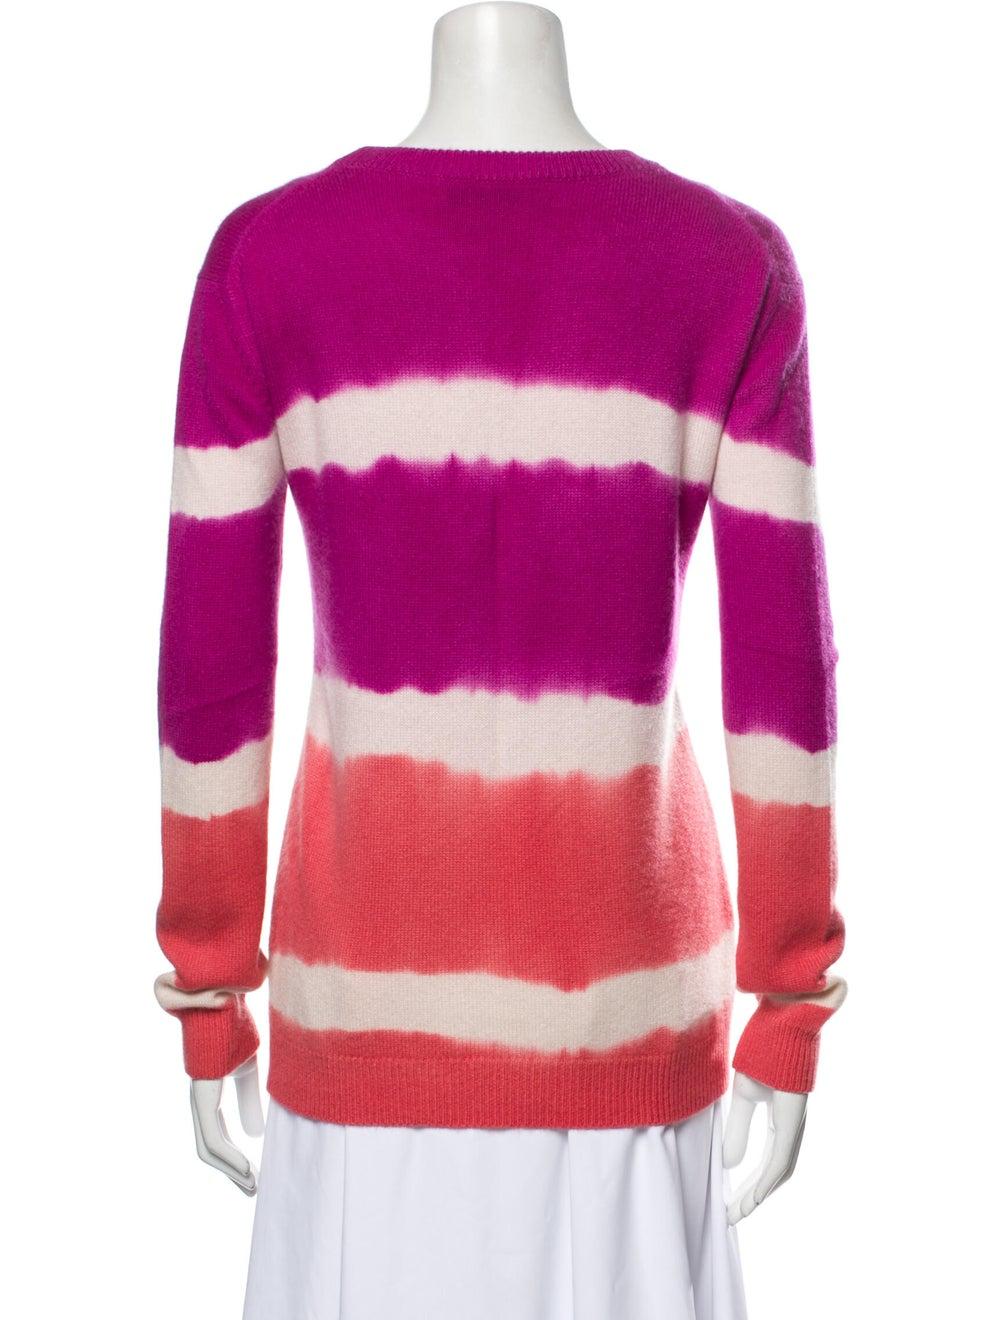 Prabal Gurung Cashmere Tie-Dye Print Sweater Purp… - image 3